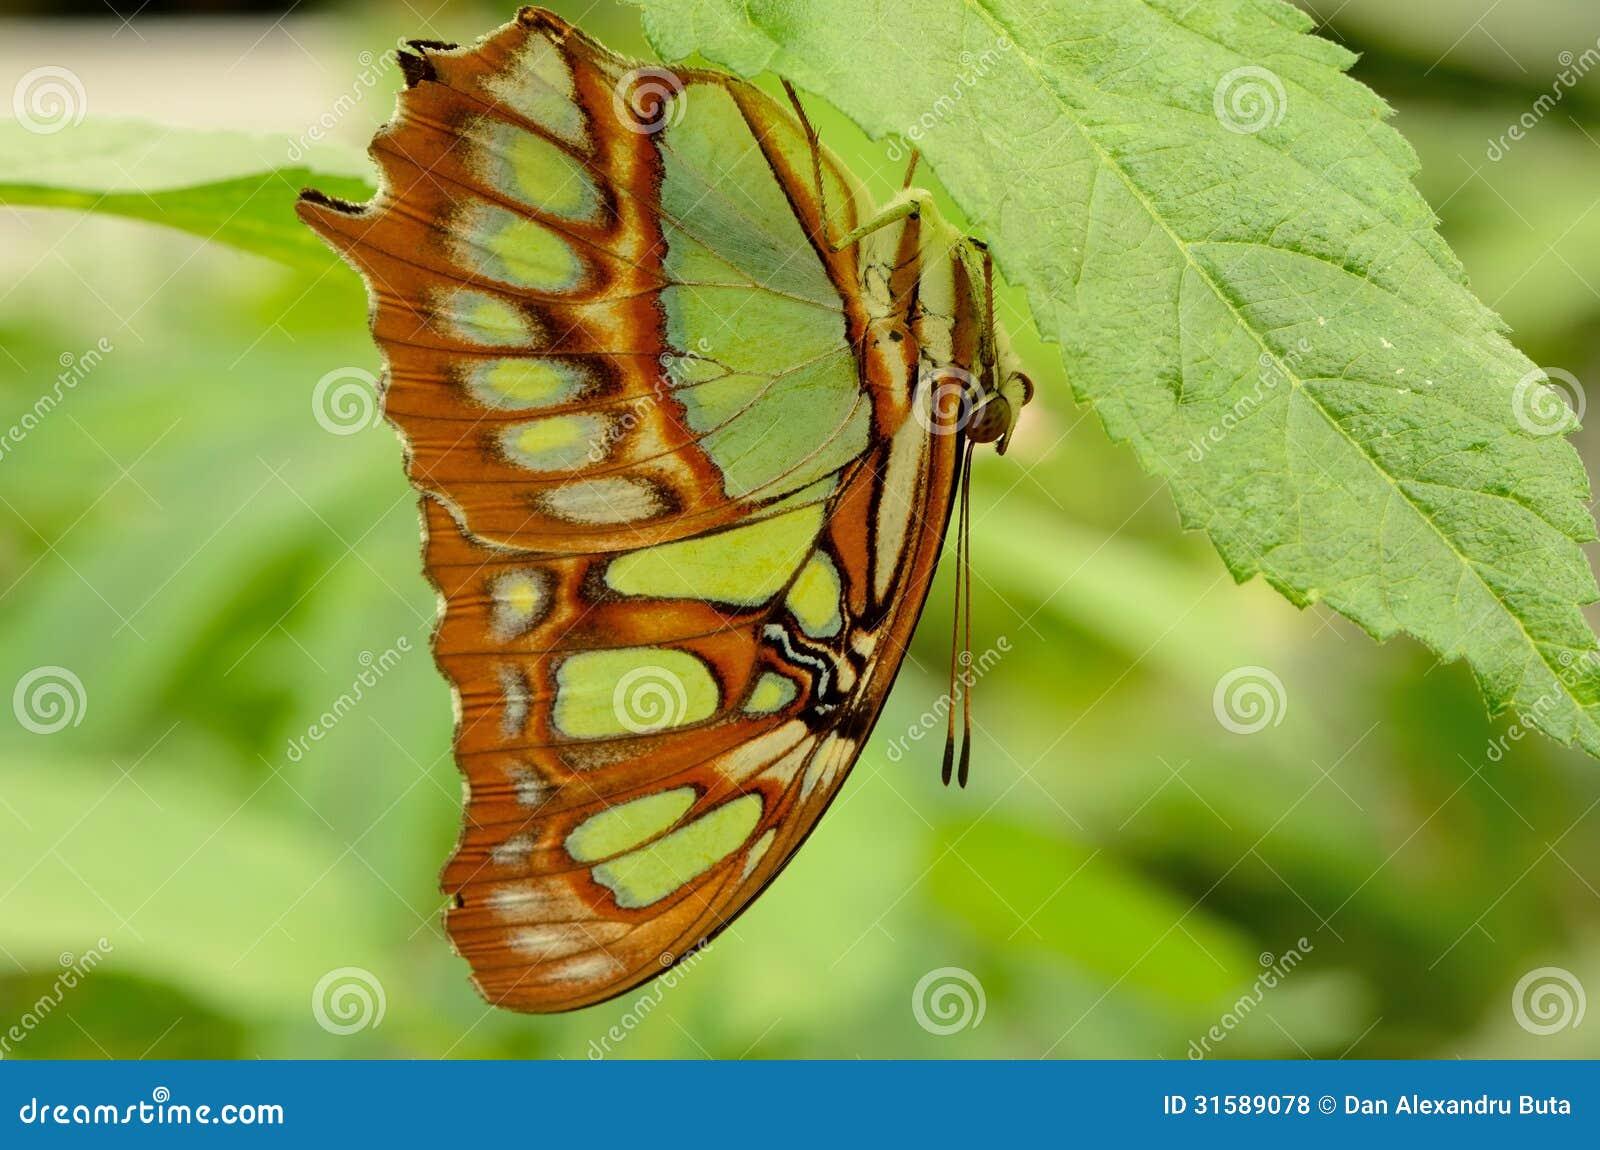 Perfil de una mariposa en una hoja